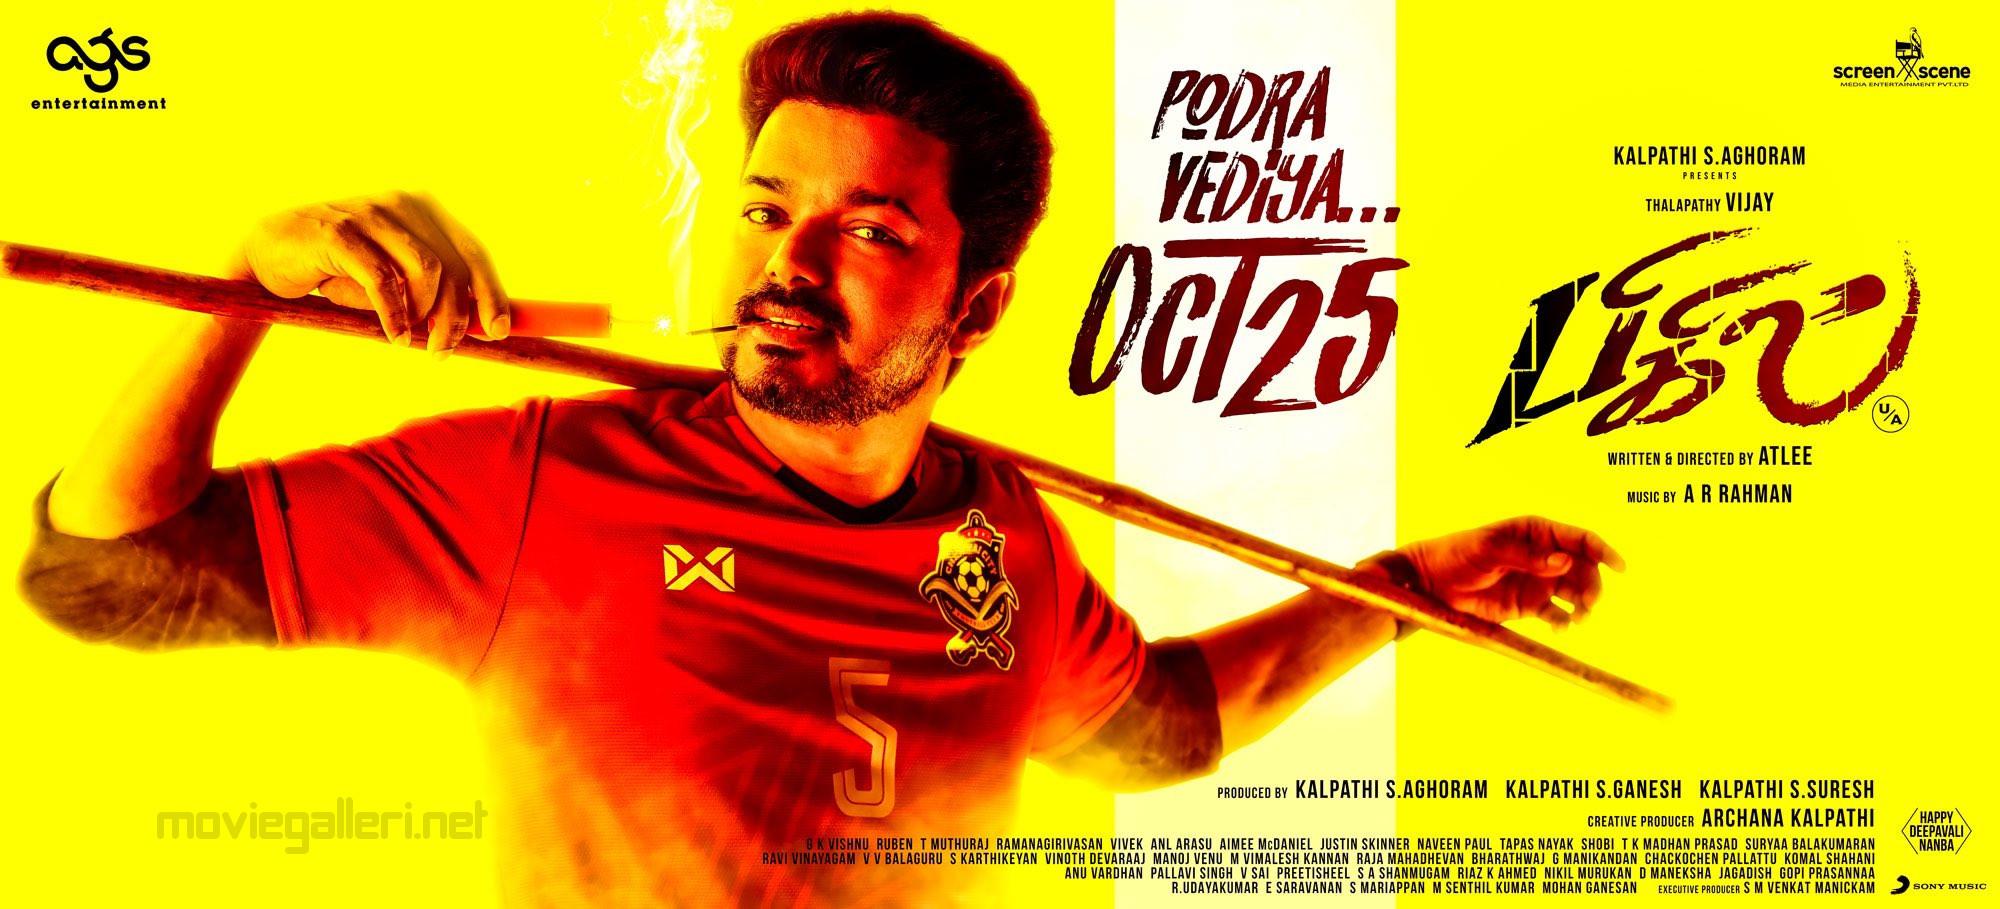 Thalapathy Vijay Bigil Movie Podra Vediya Oct 25 Poster HD